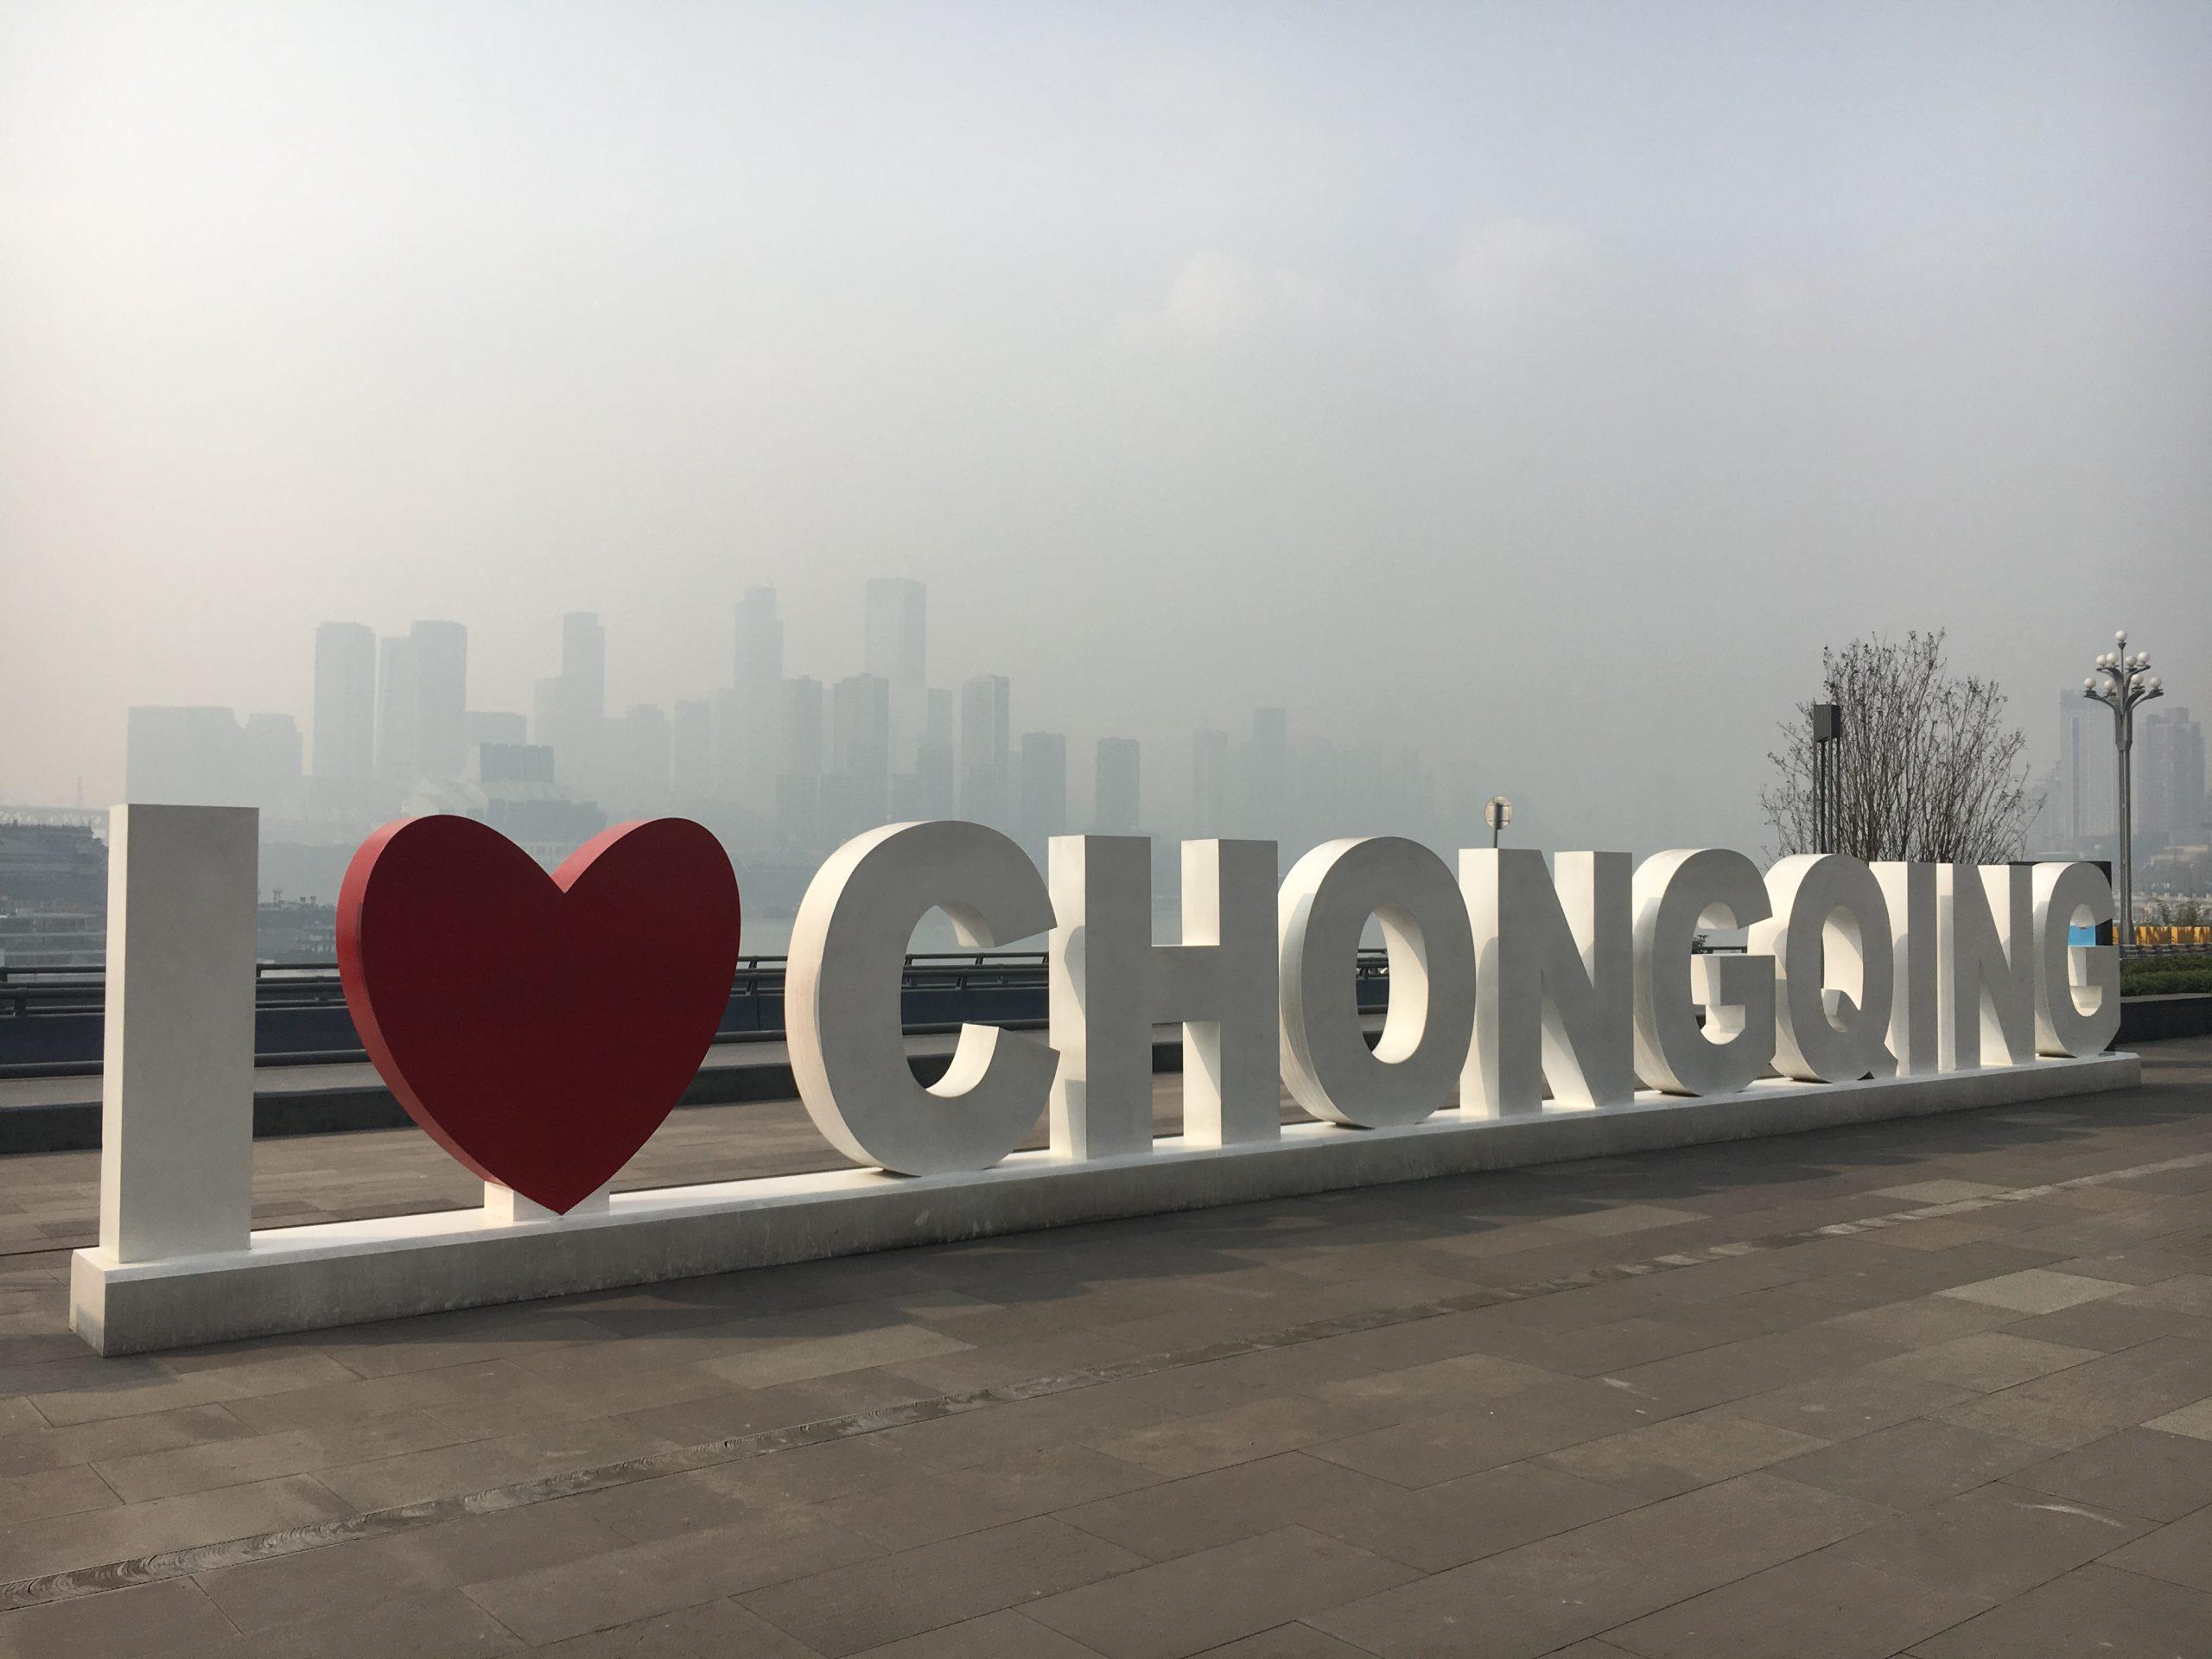 I love Chongqing sign